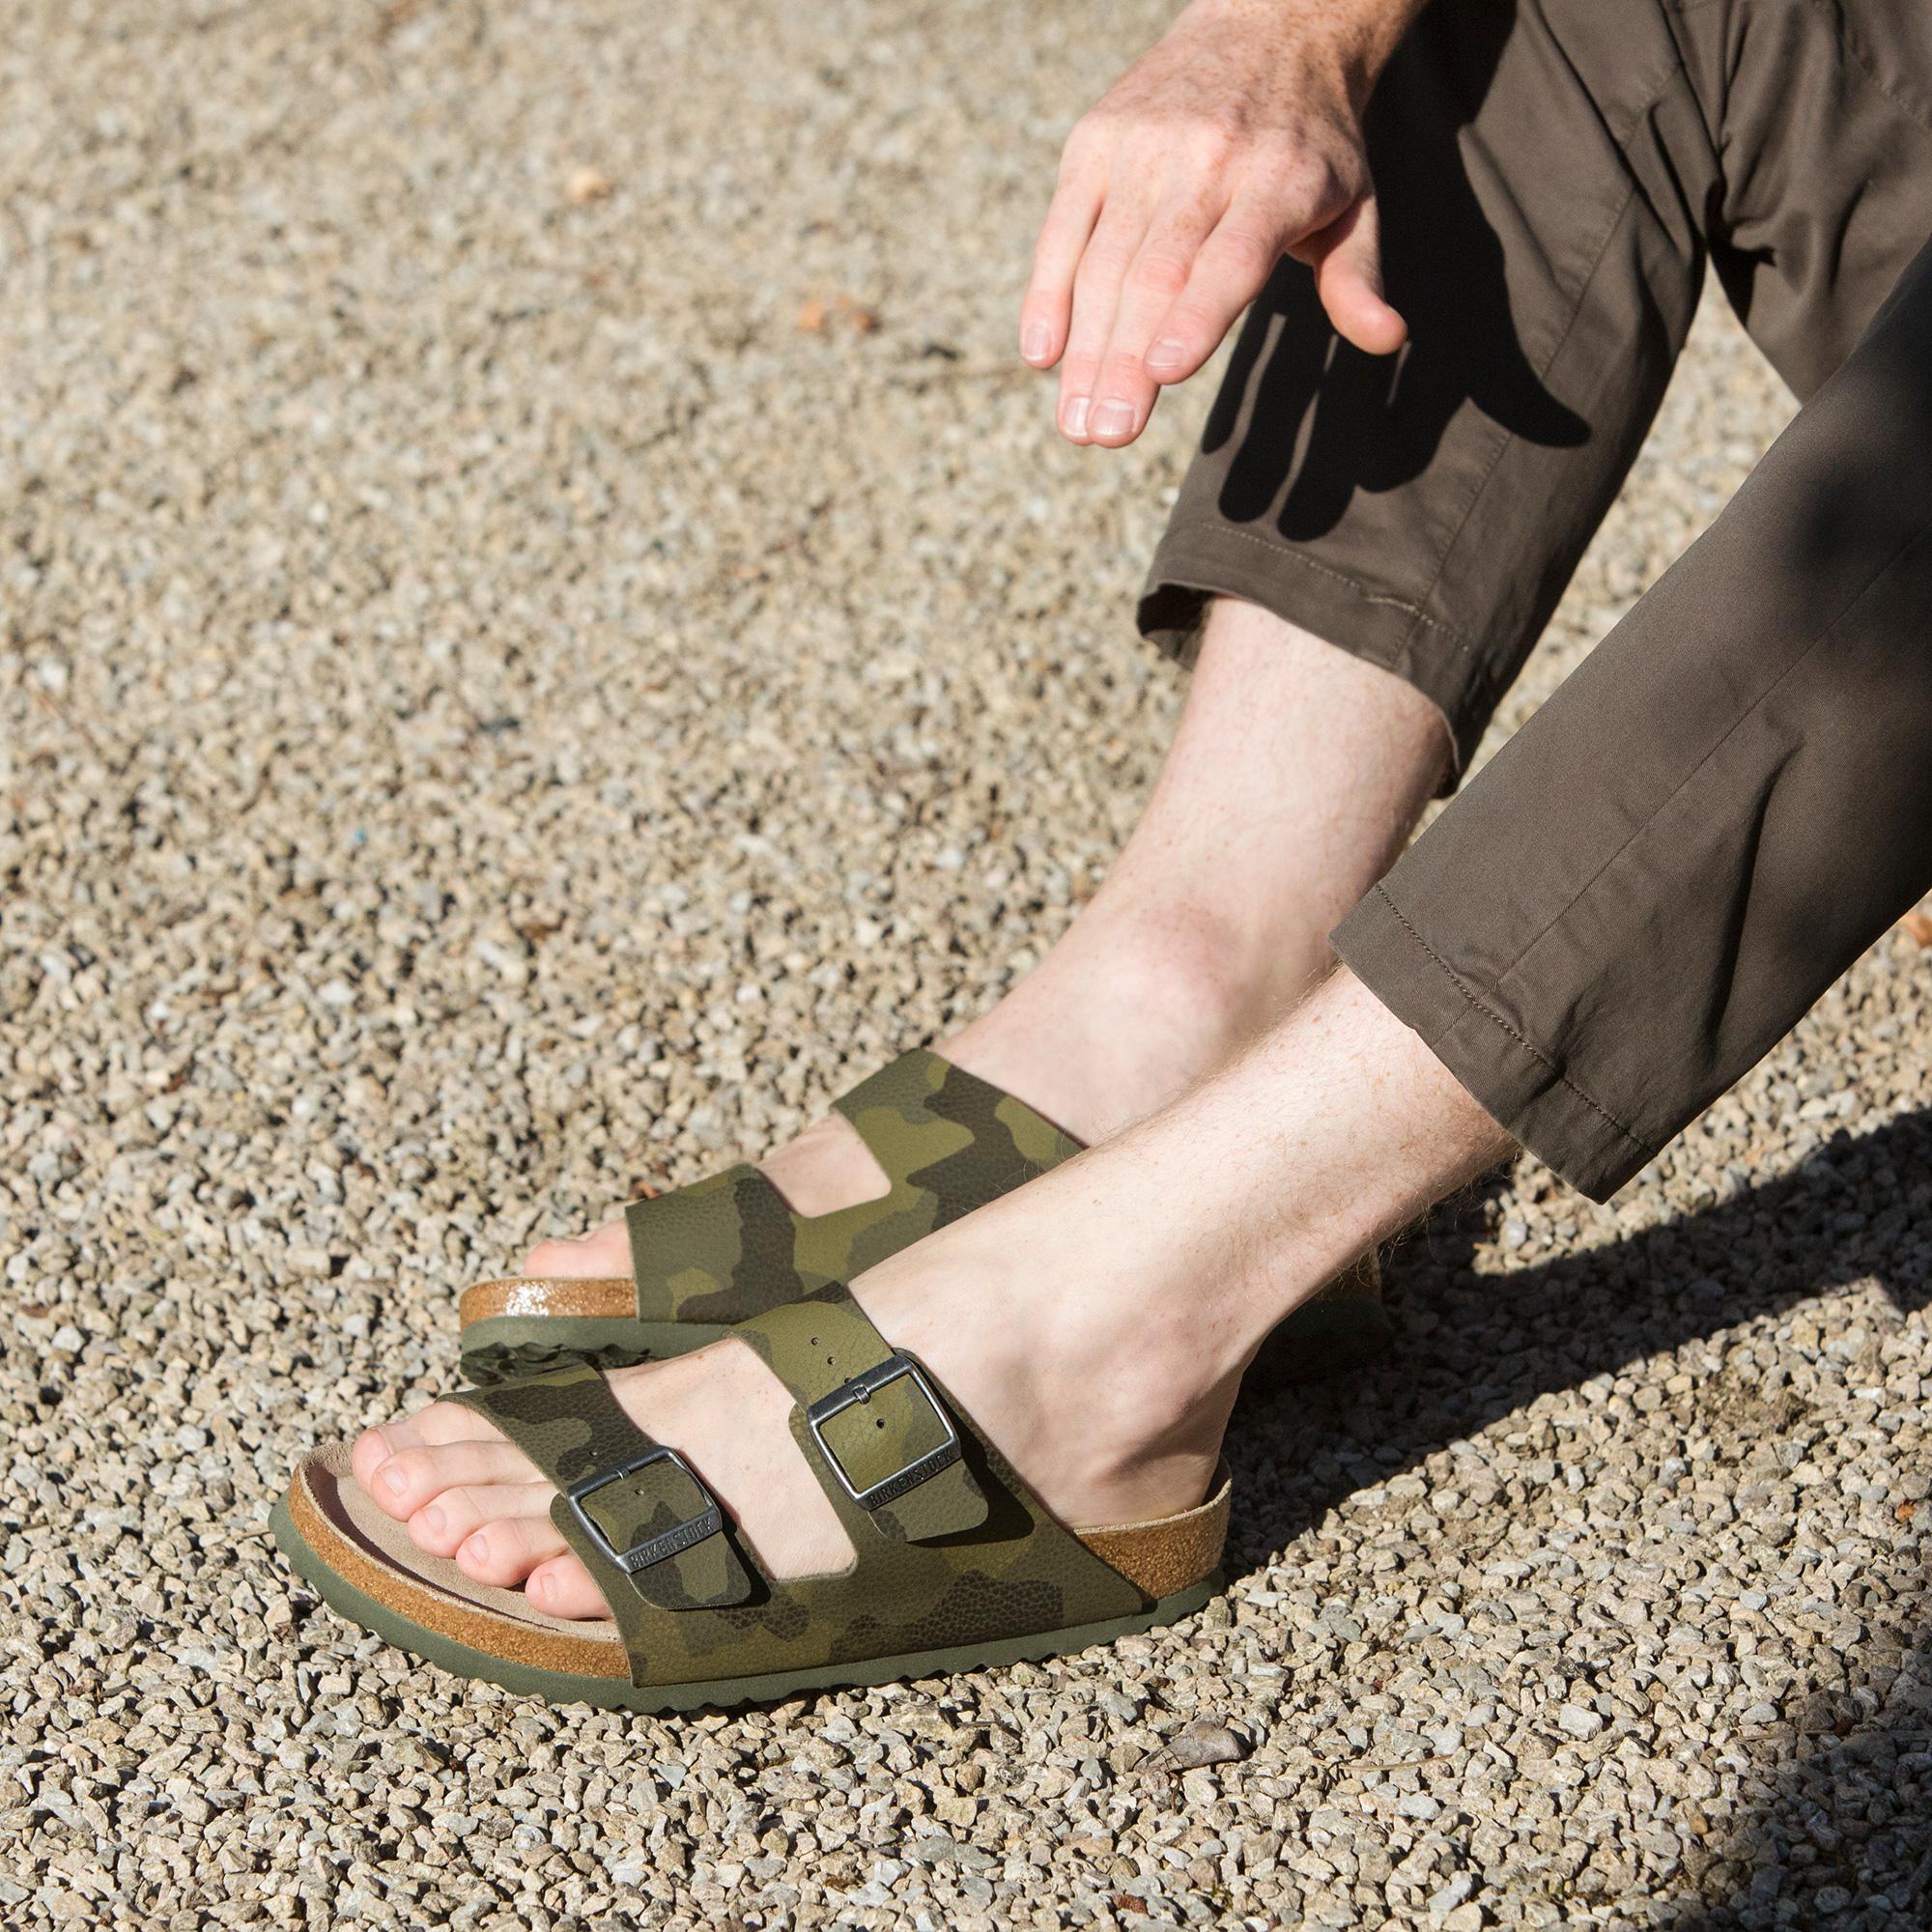 Birkenstock Arizona Camouflage Sandals, Desert Soil Camo